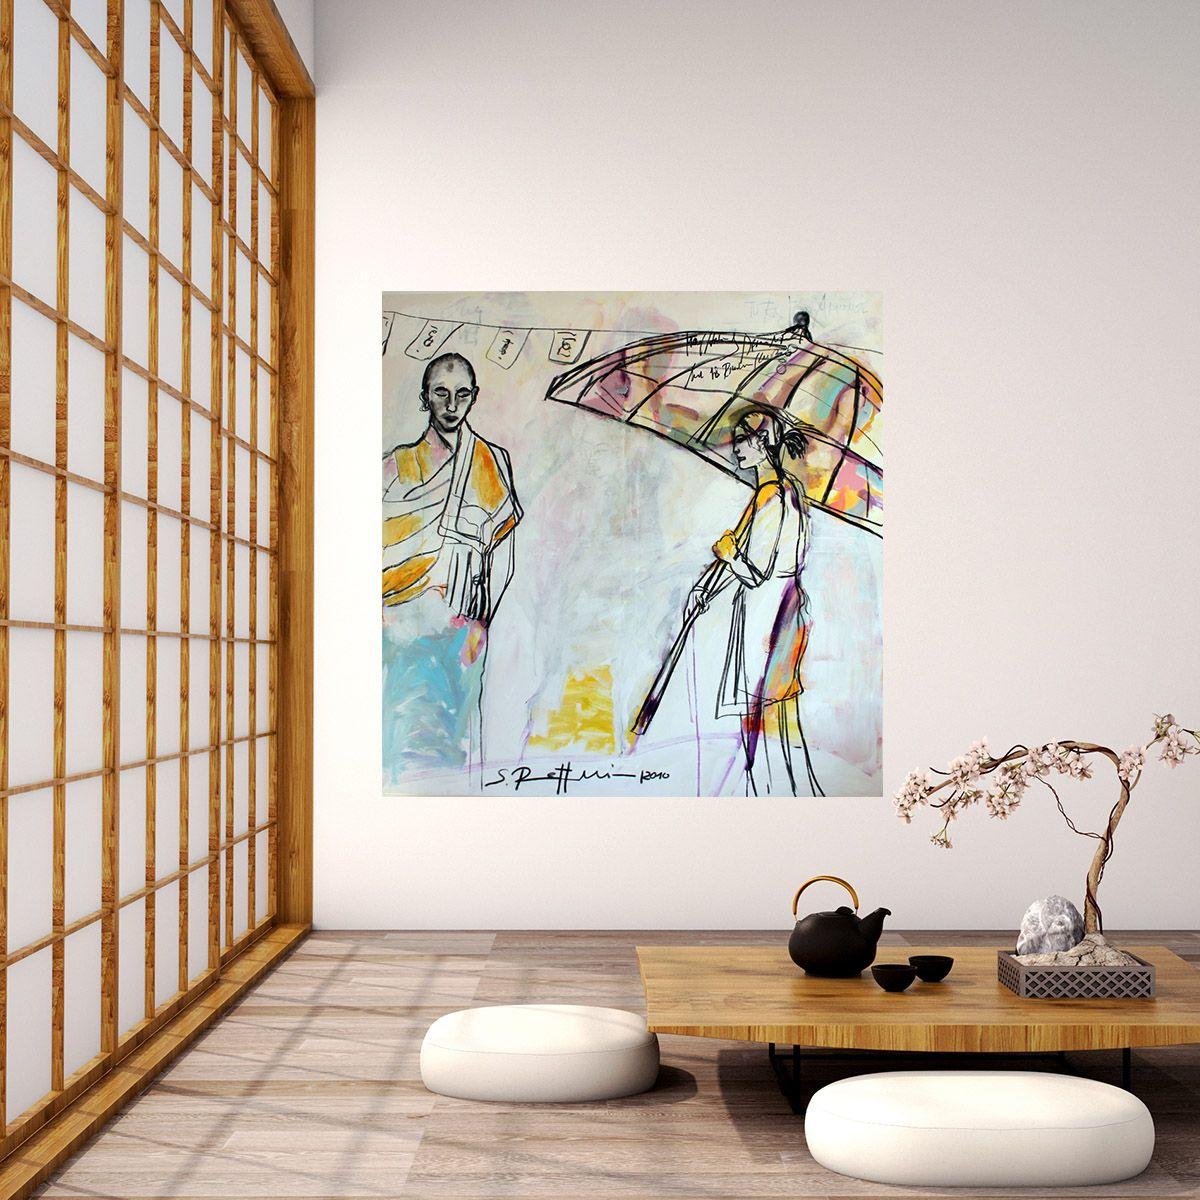 Acrylbild Wandbild Xxl Leinwand Kunst Gemaltes Bild Leinwandbild Gemälde Die Begegnung Acrylbilder Leinwandbilder Xxl Leinwand